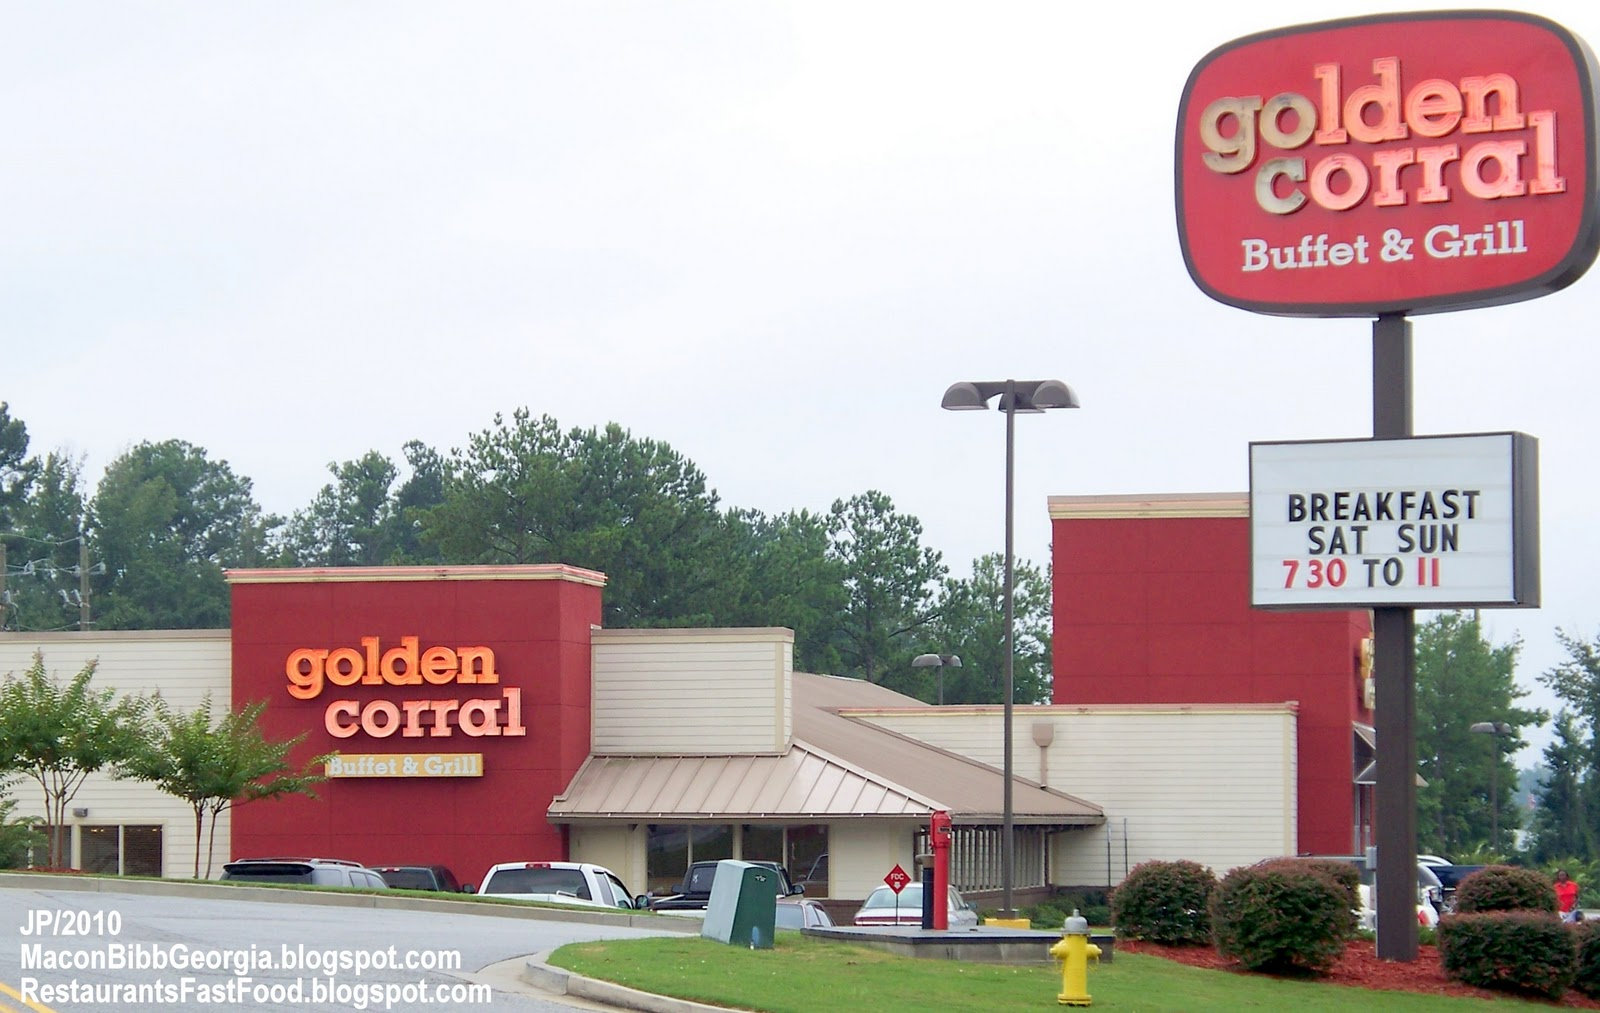 http://2.bp.blogspot.com/_OLc2TjnHOgQ/TQEEIheX1hI/AAAAAAACTJM/_rE5KLEOdQI/s1600/GOLDEN+CORRAL+Macon+Georgia%252C+Golden+Corral+Buffet+%2526+Grill+Restaurant+Macon+GA.+.JPG